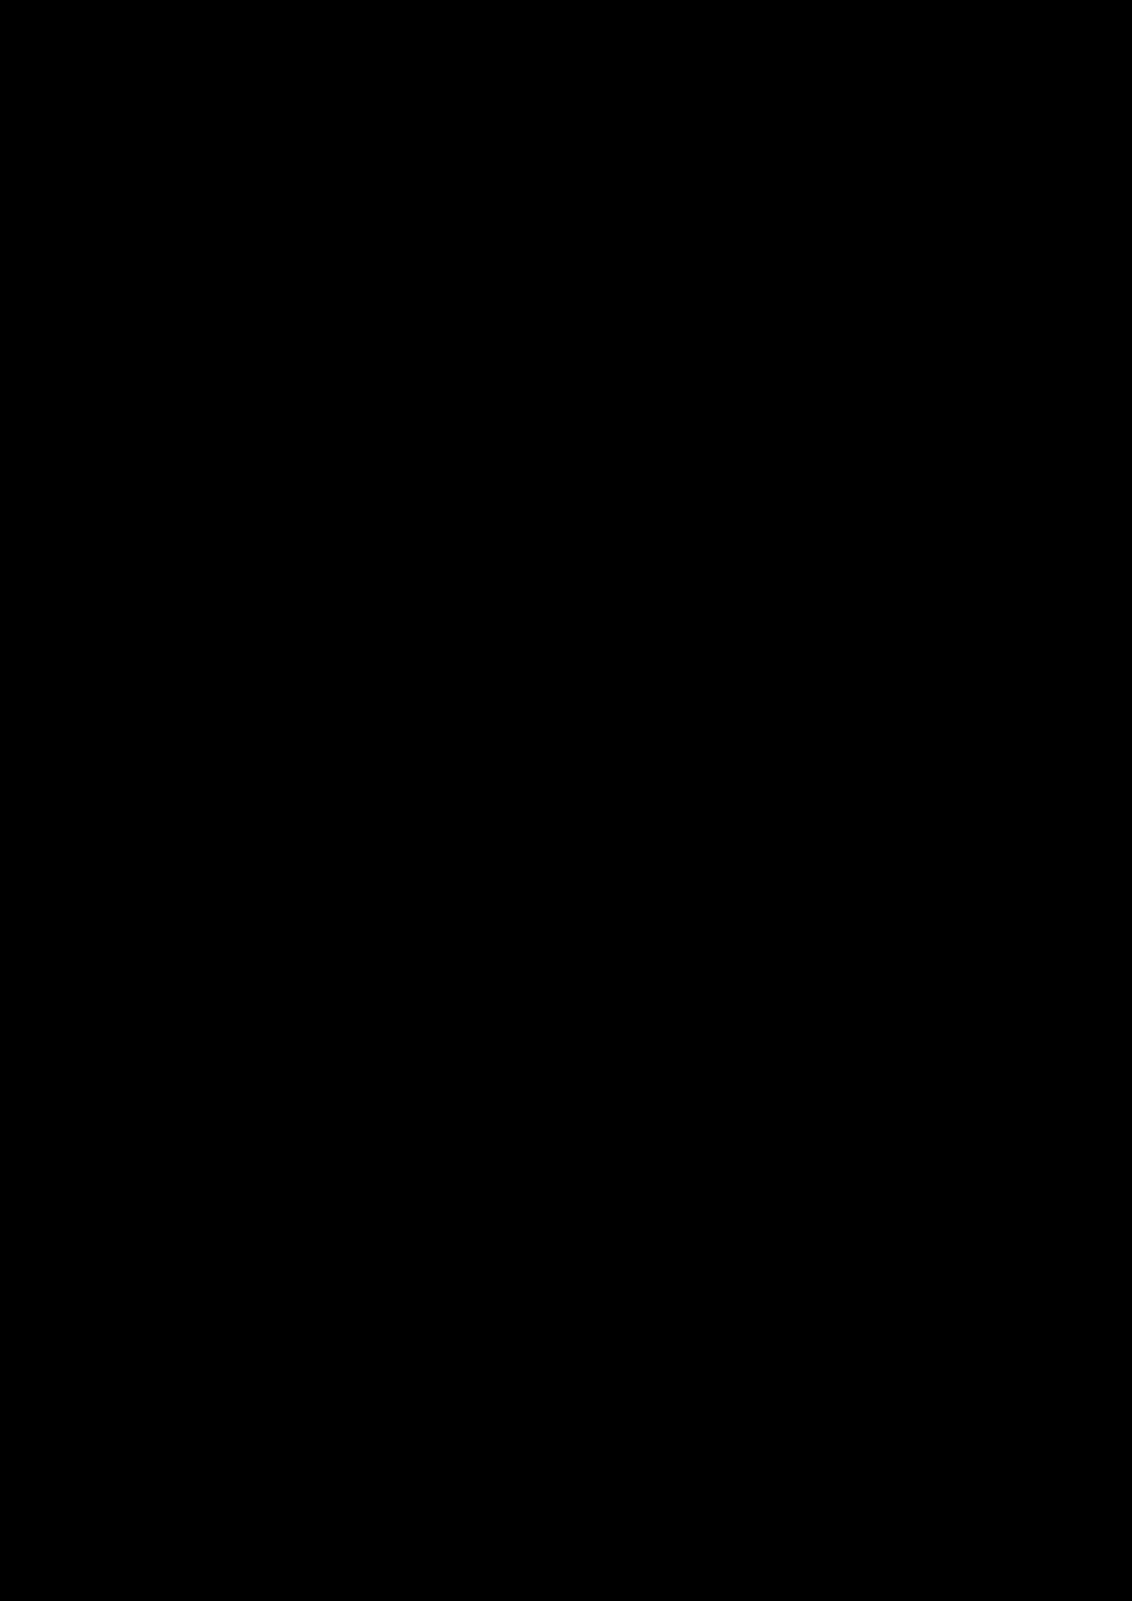 Hojdenie za Tri Morya slide, Image 1